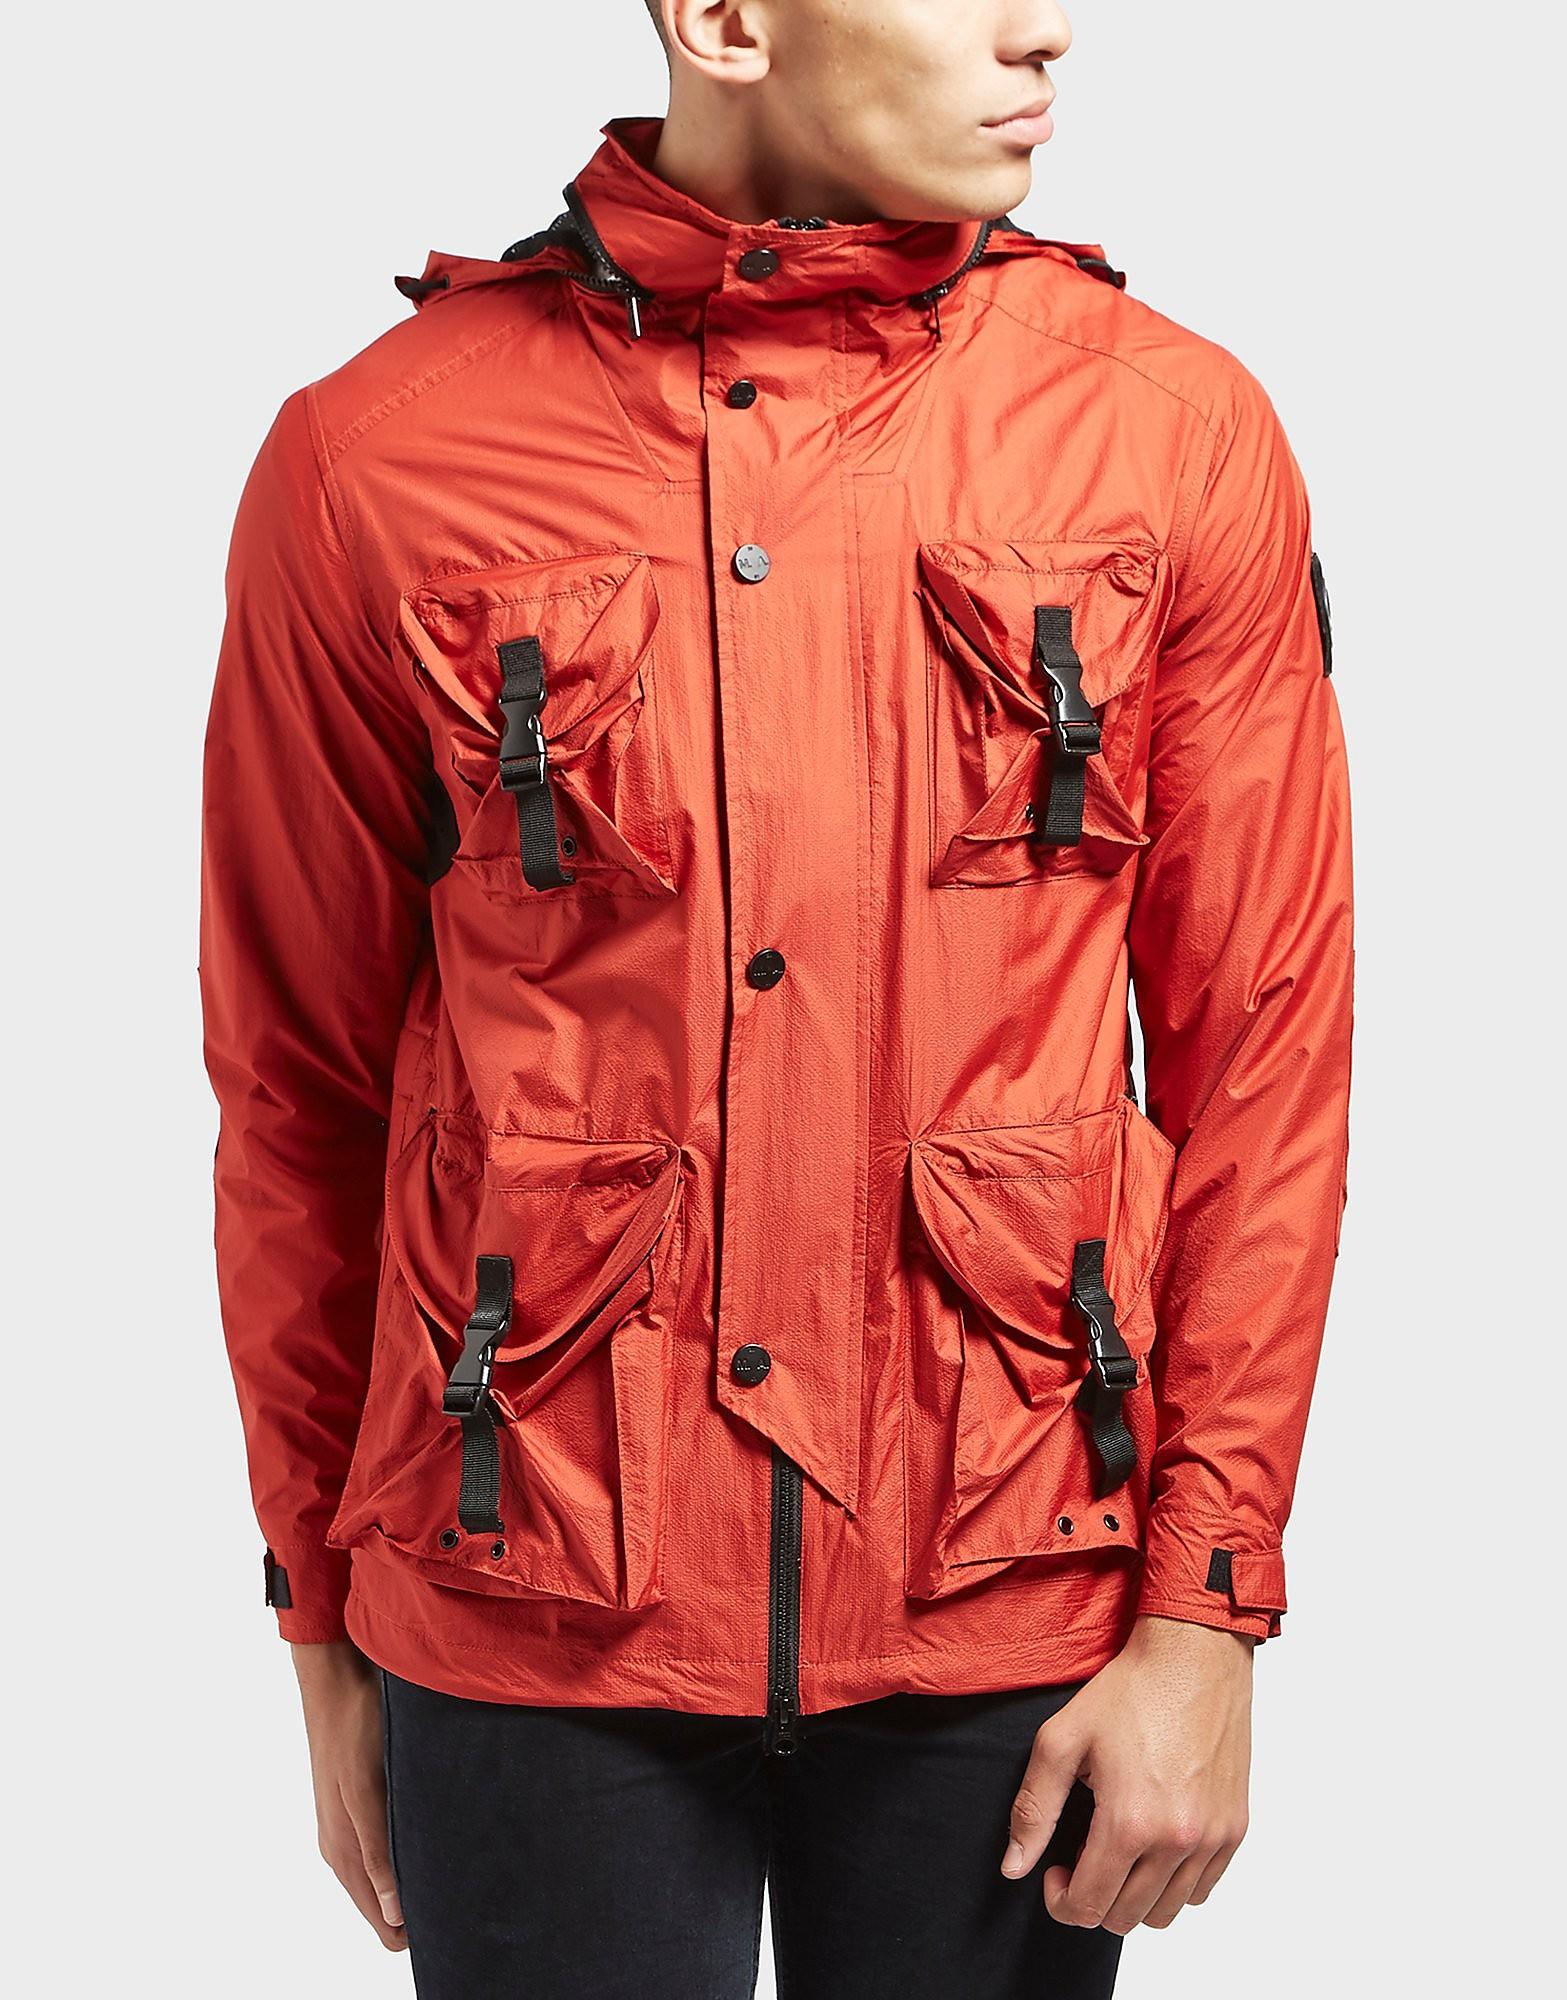 Marshall Artist Micro Ripstop Parachute Lightweight Jacket